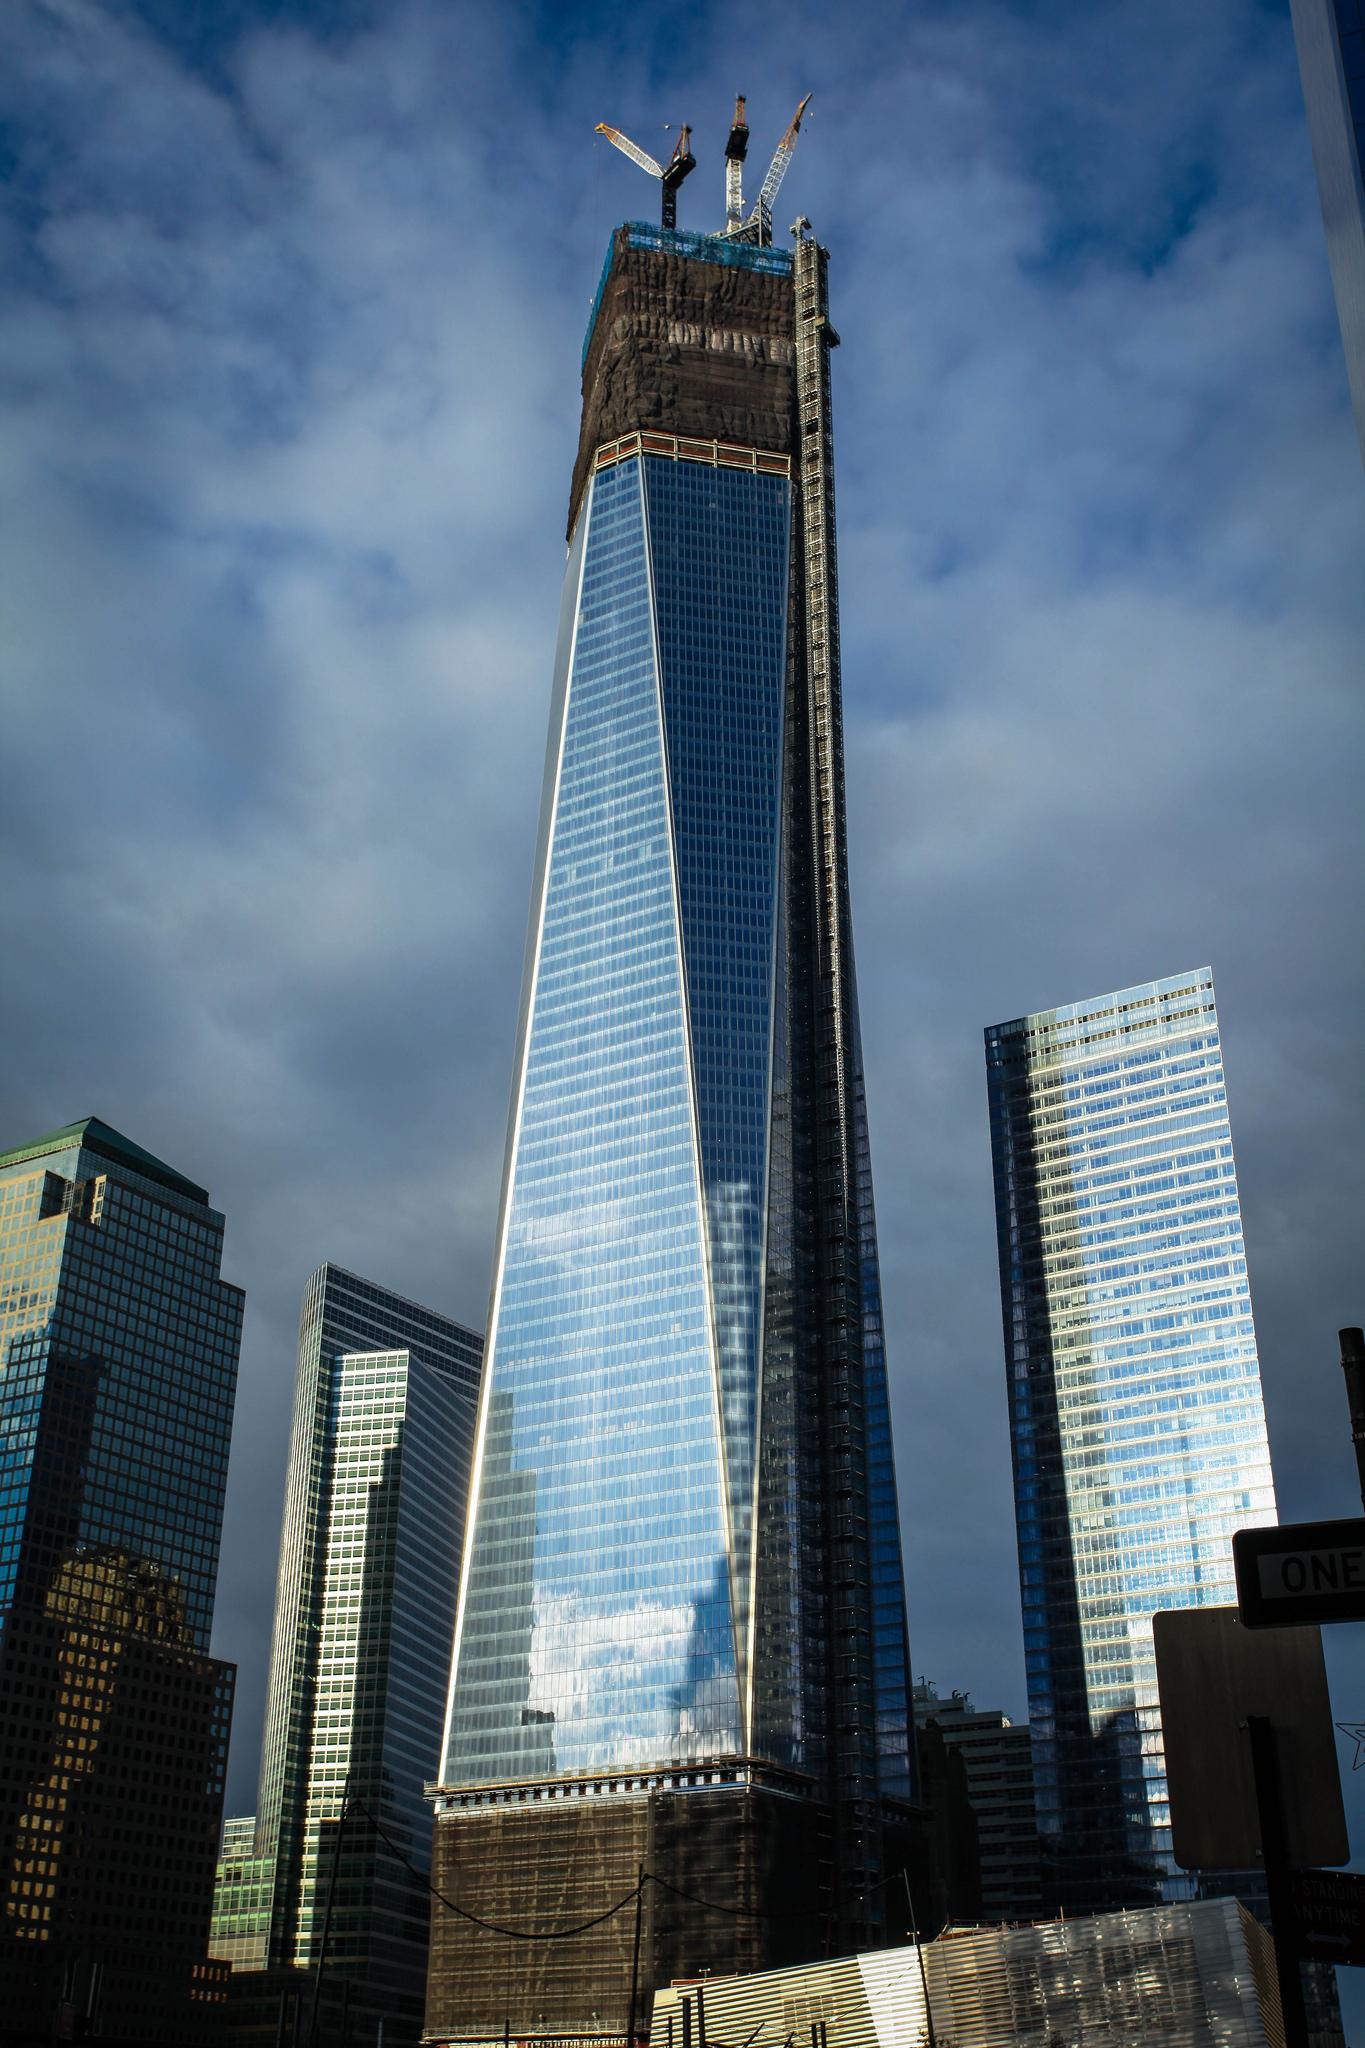 world trade center World trade center backround,construction,anticipated terrorist target.